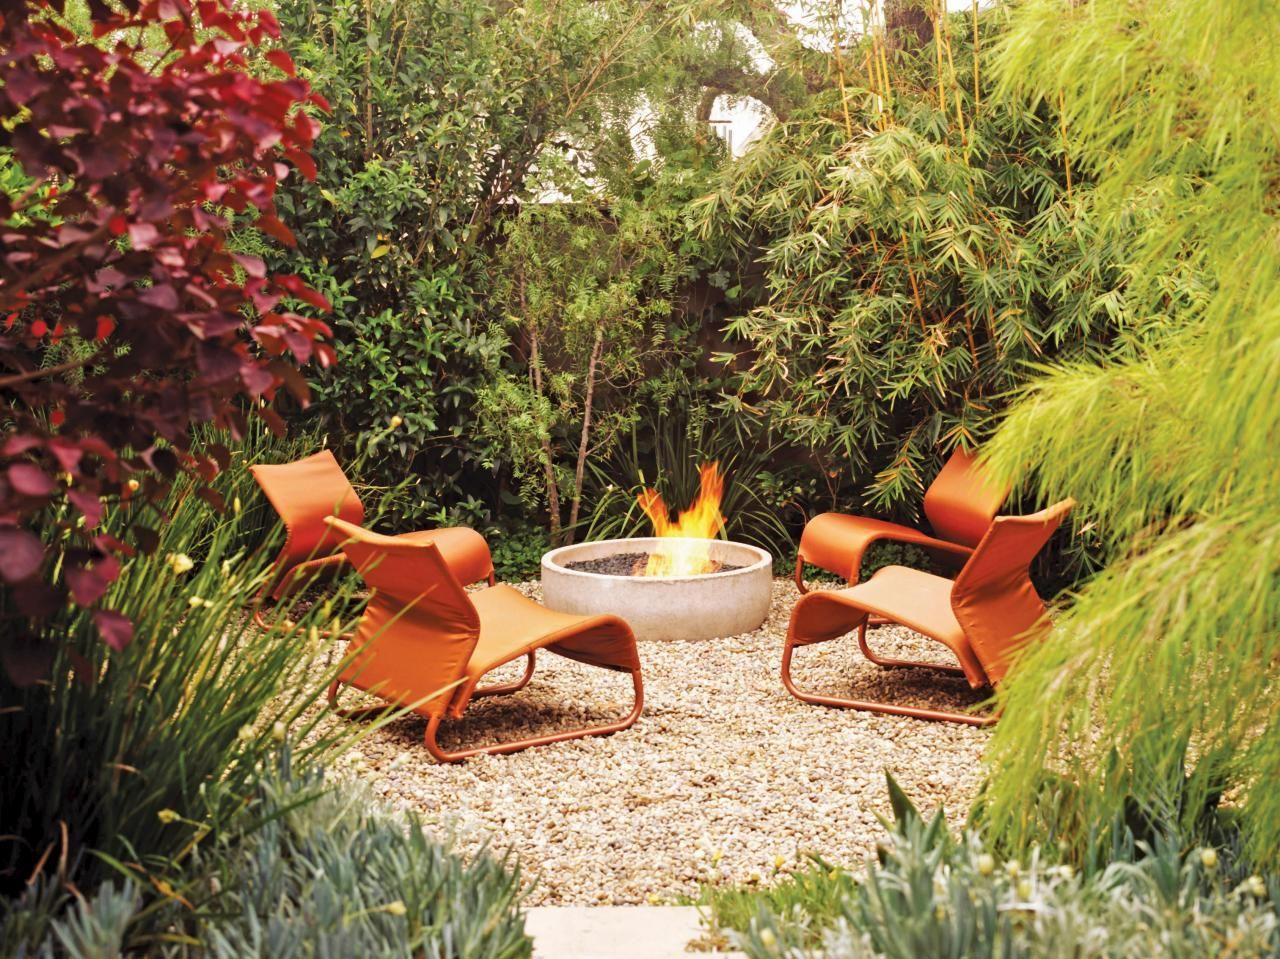 Fire Pit Design Ideas | Pinterest | Fire pit designs, Hgtv and ...